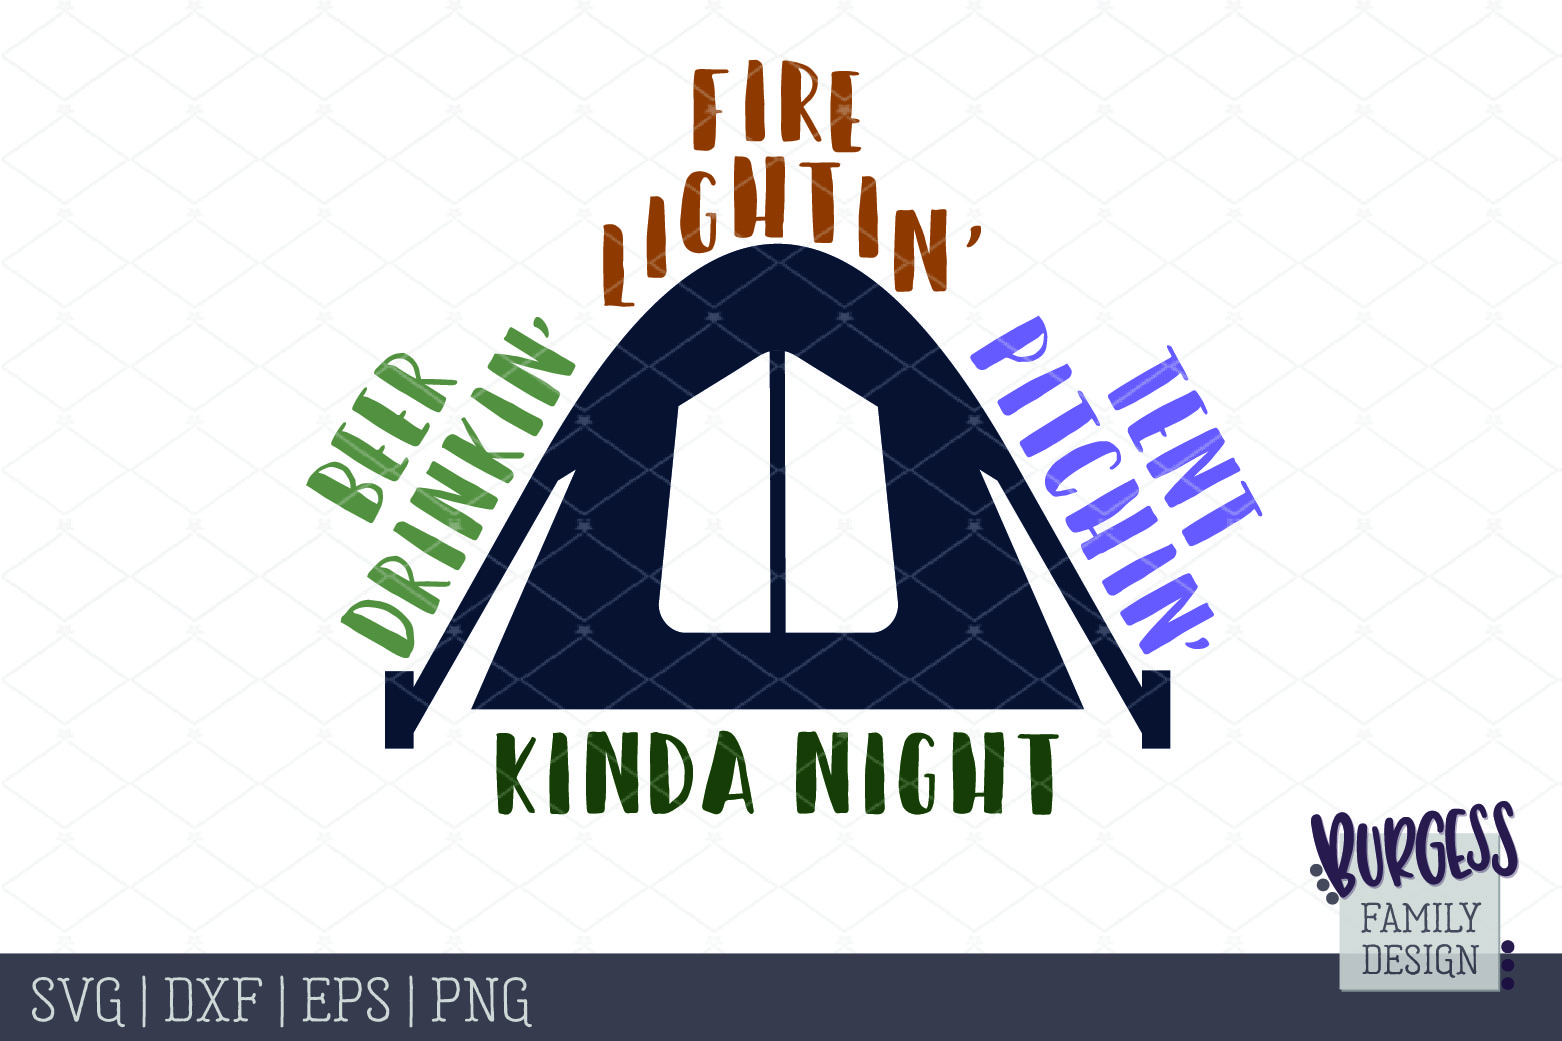 Beer drinkin' Fire burnin' tent pitchin kinda night   SVG DX example image 2